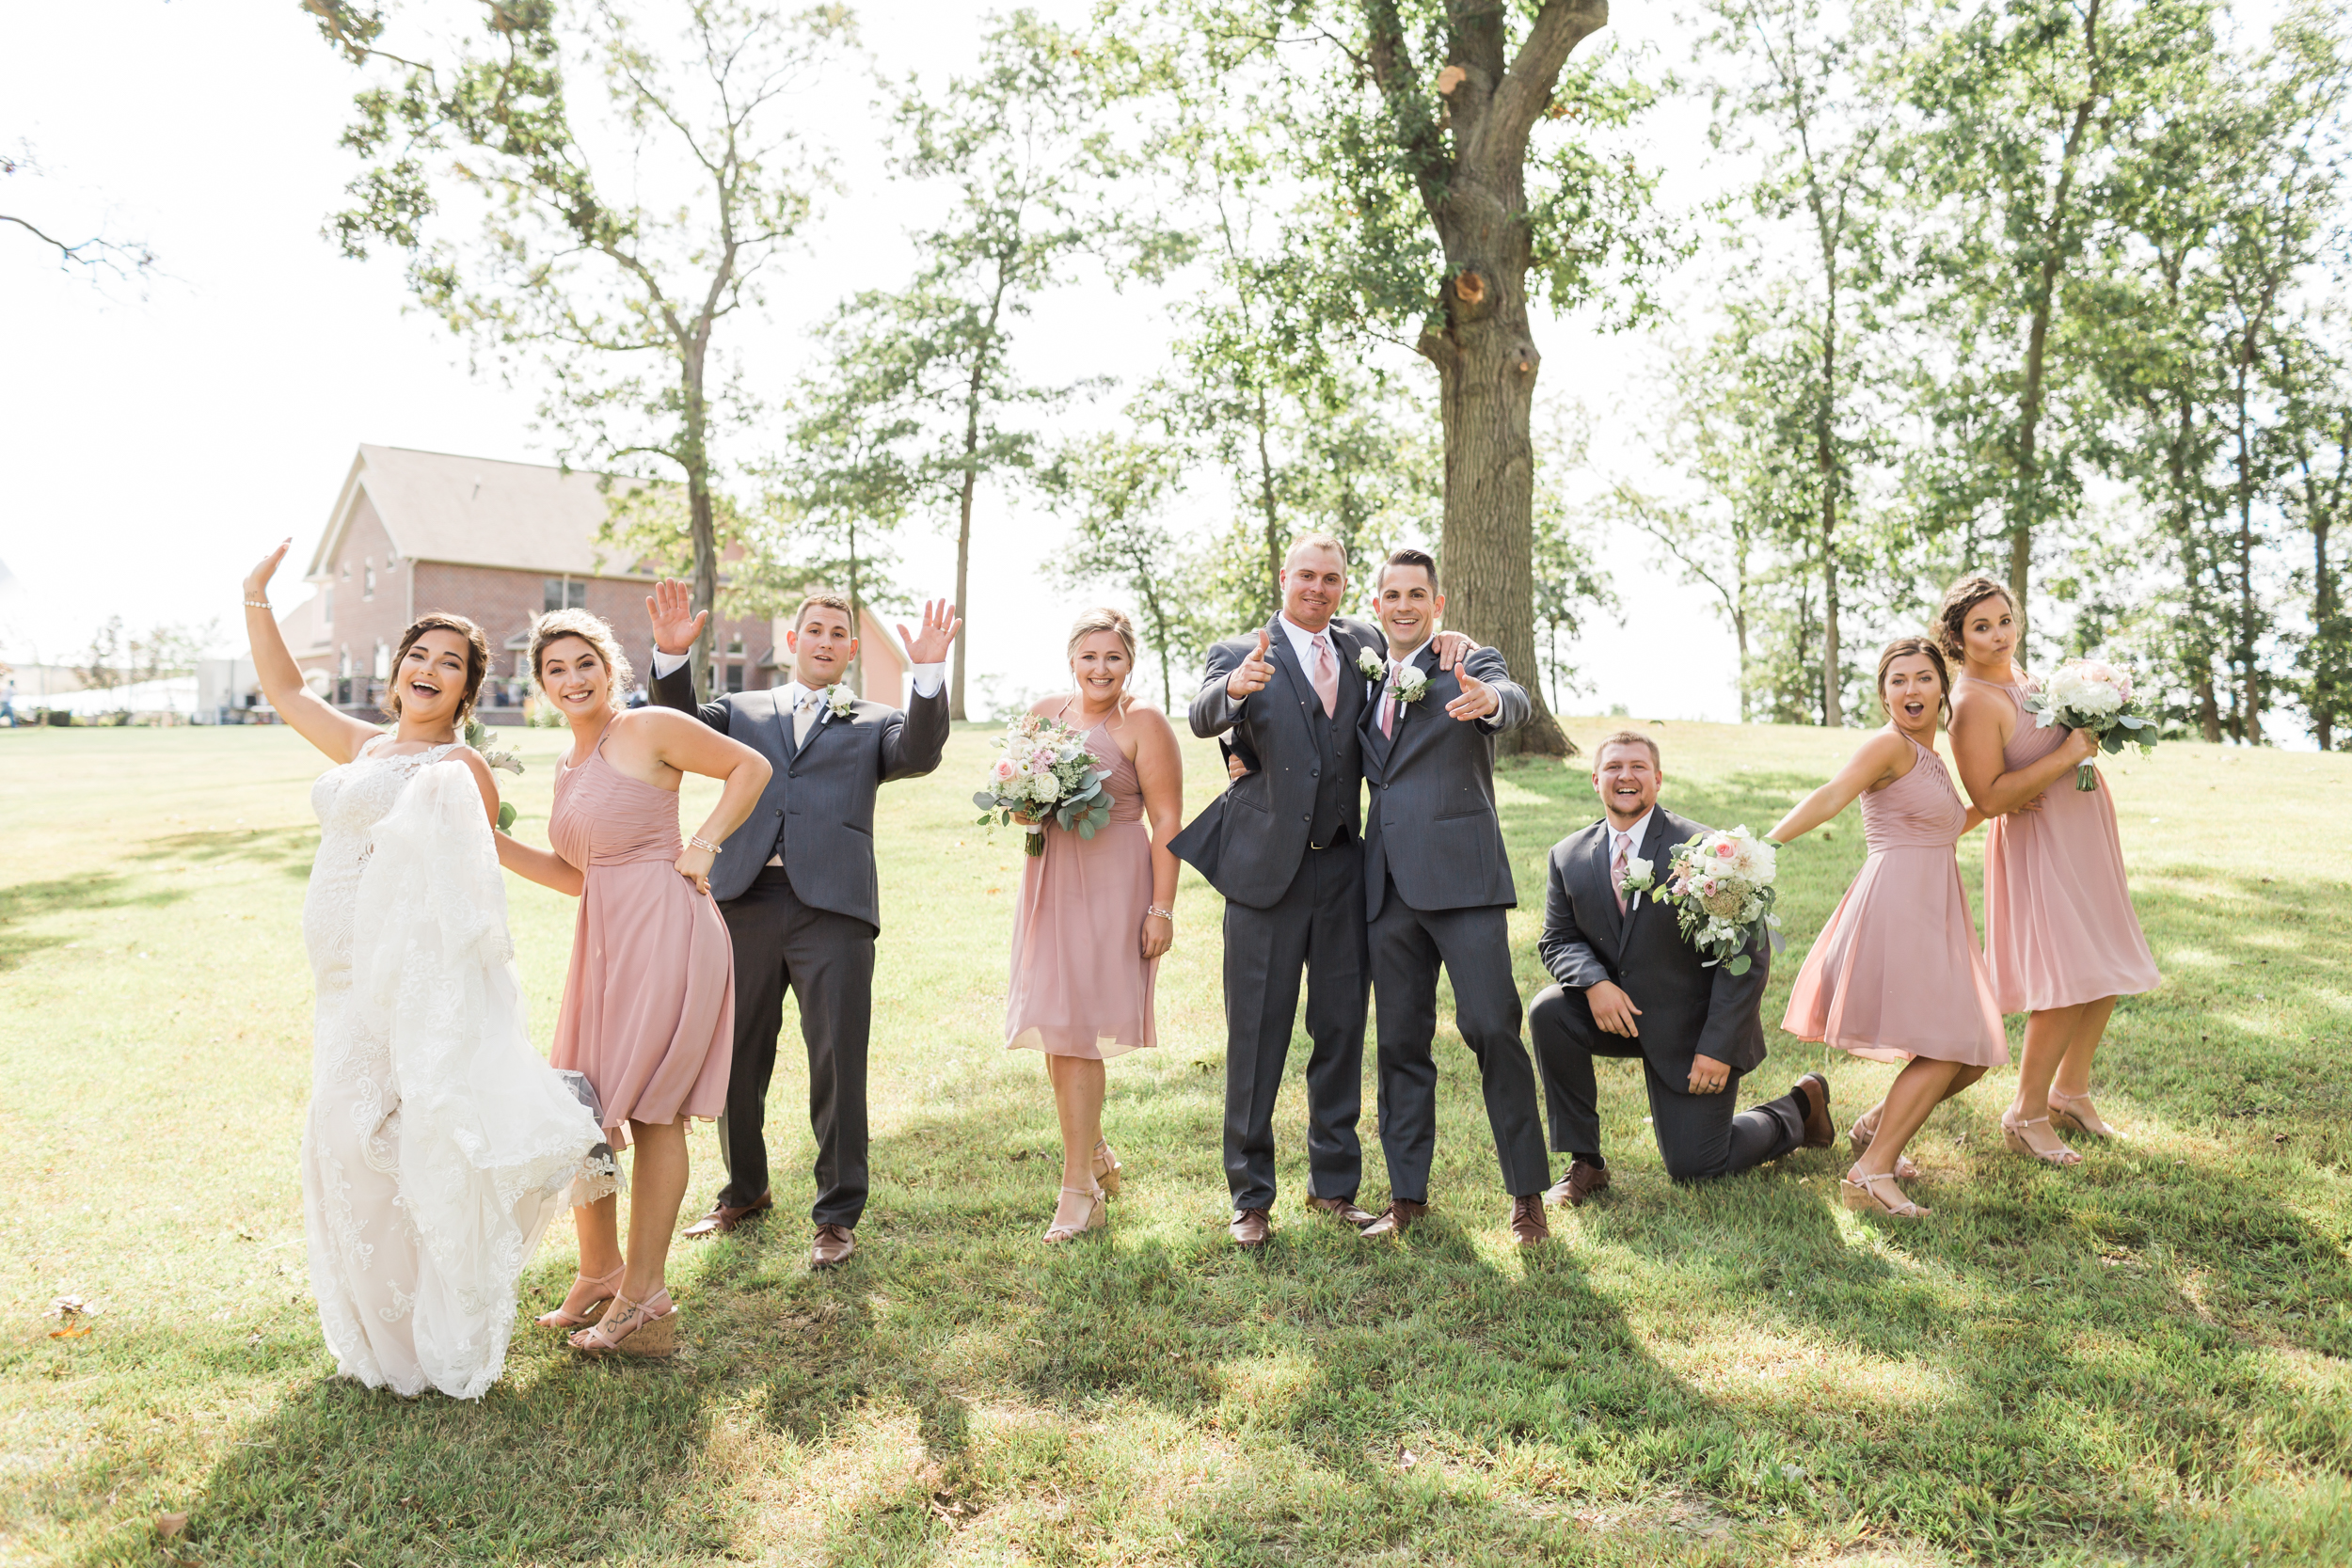 romanticcountrywedding--45.jpg